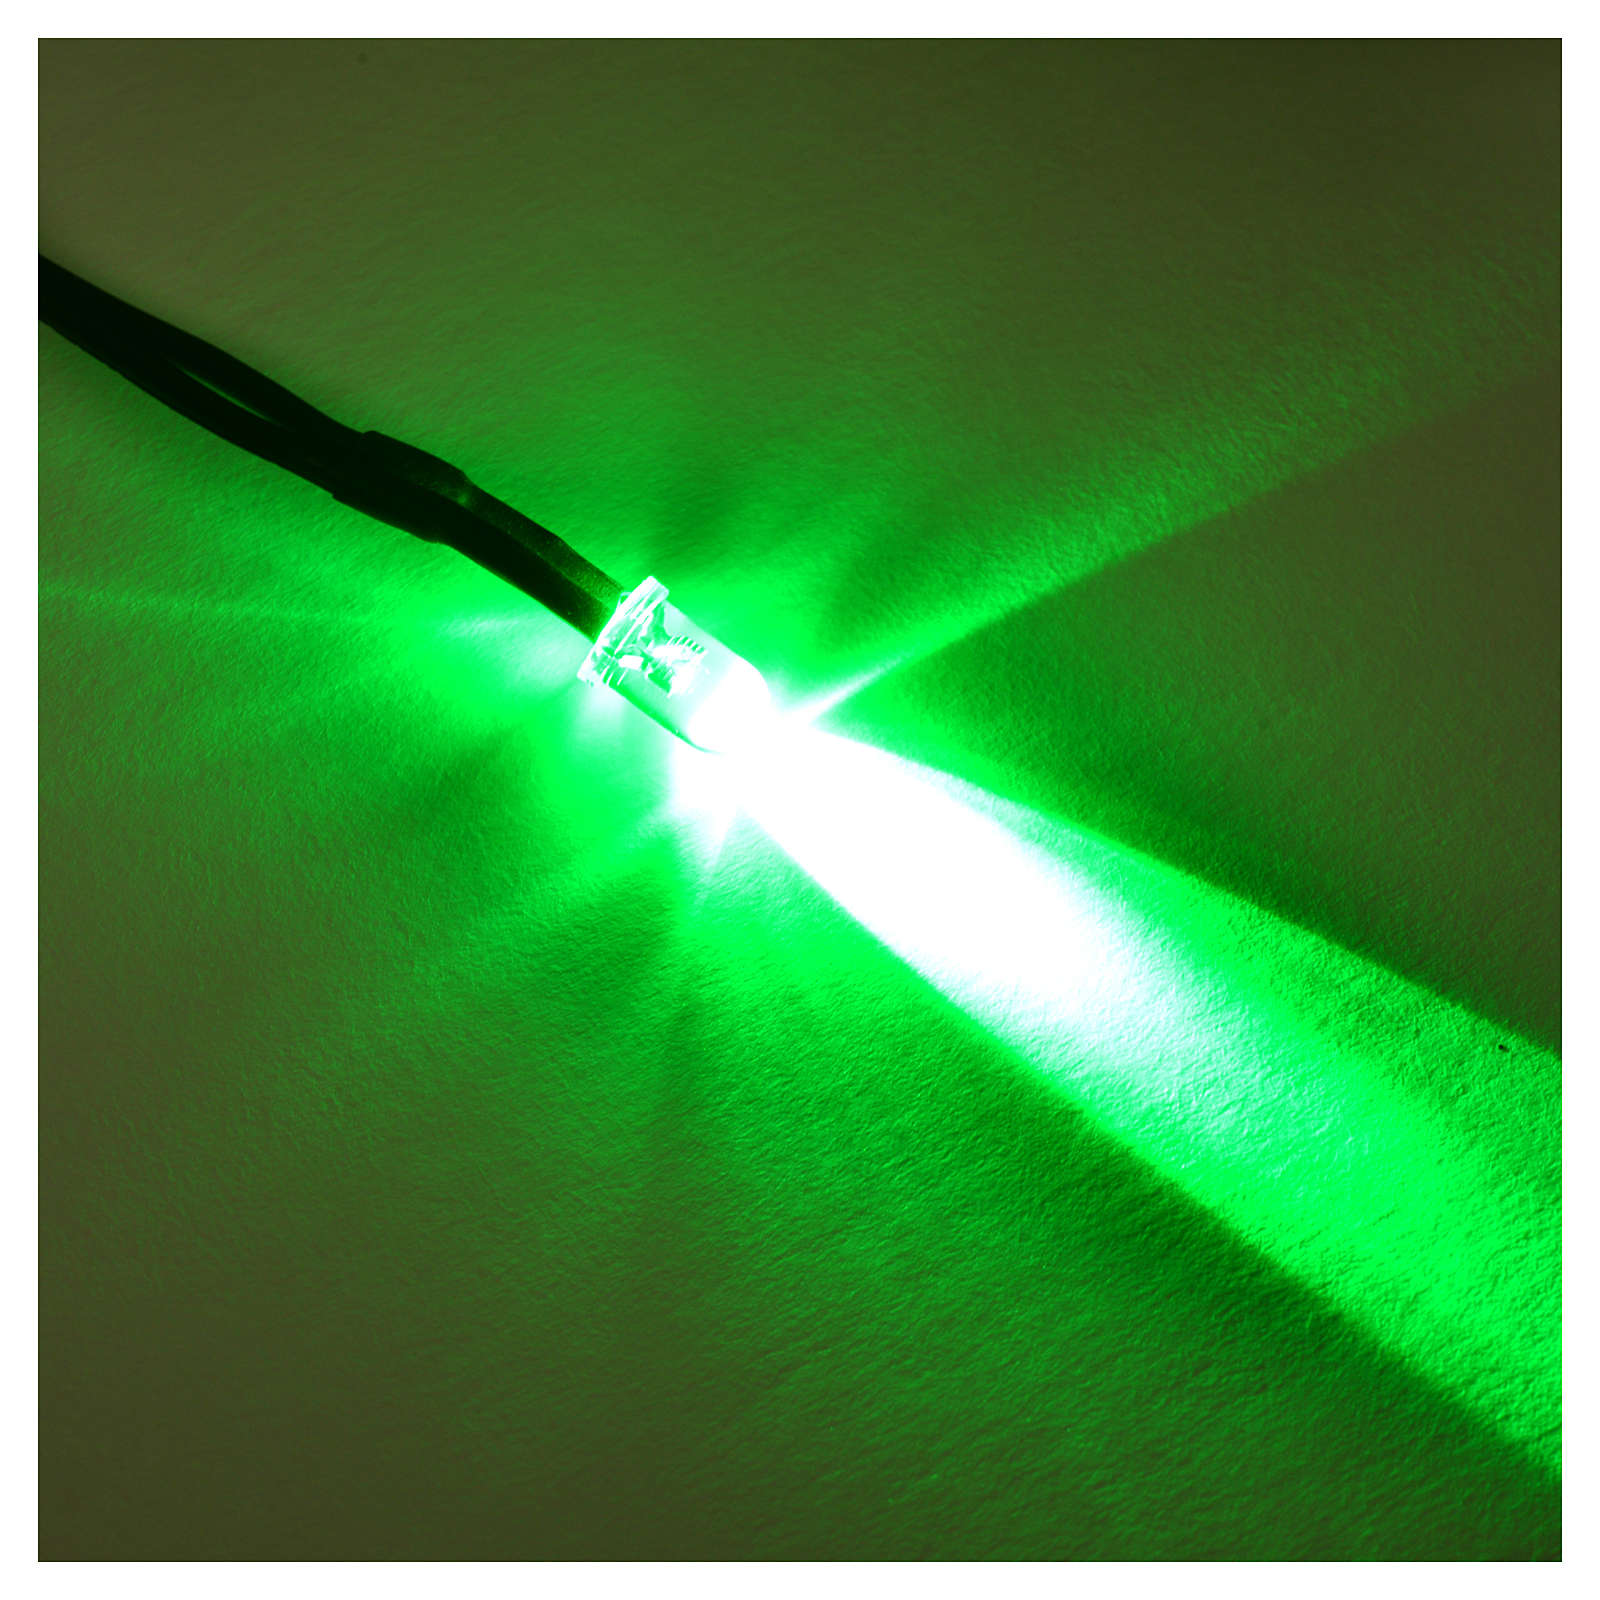 LED light, 5 mm, green for Frisalight control units 4